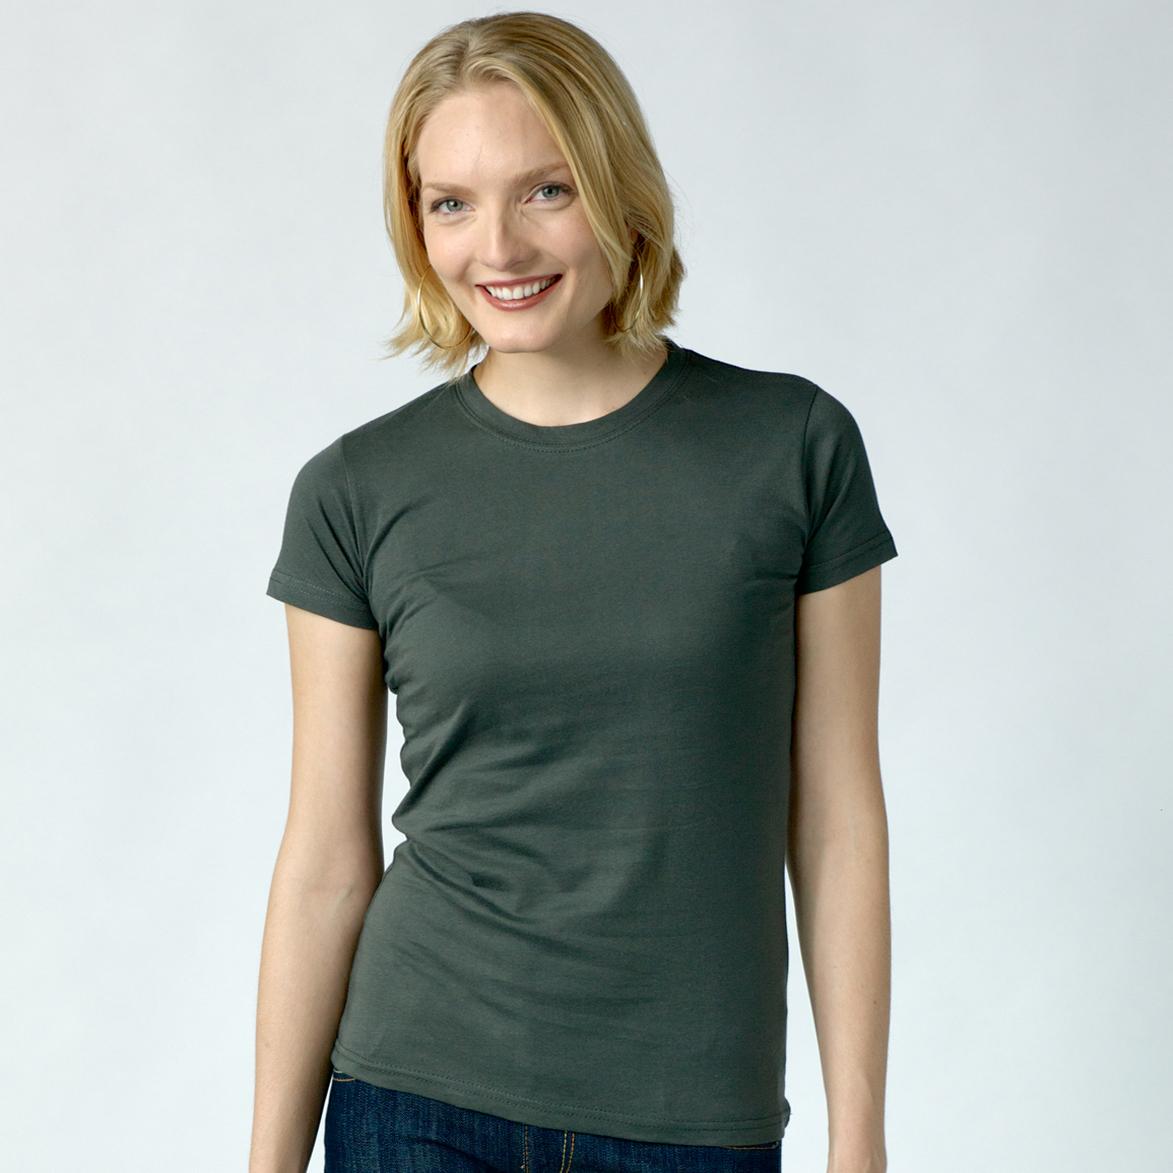 Tultex 0213 - Ladies' Fine Jersey Tee